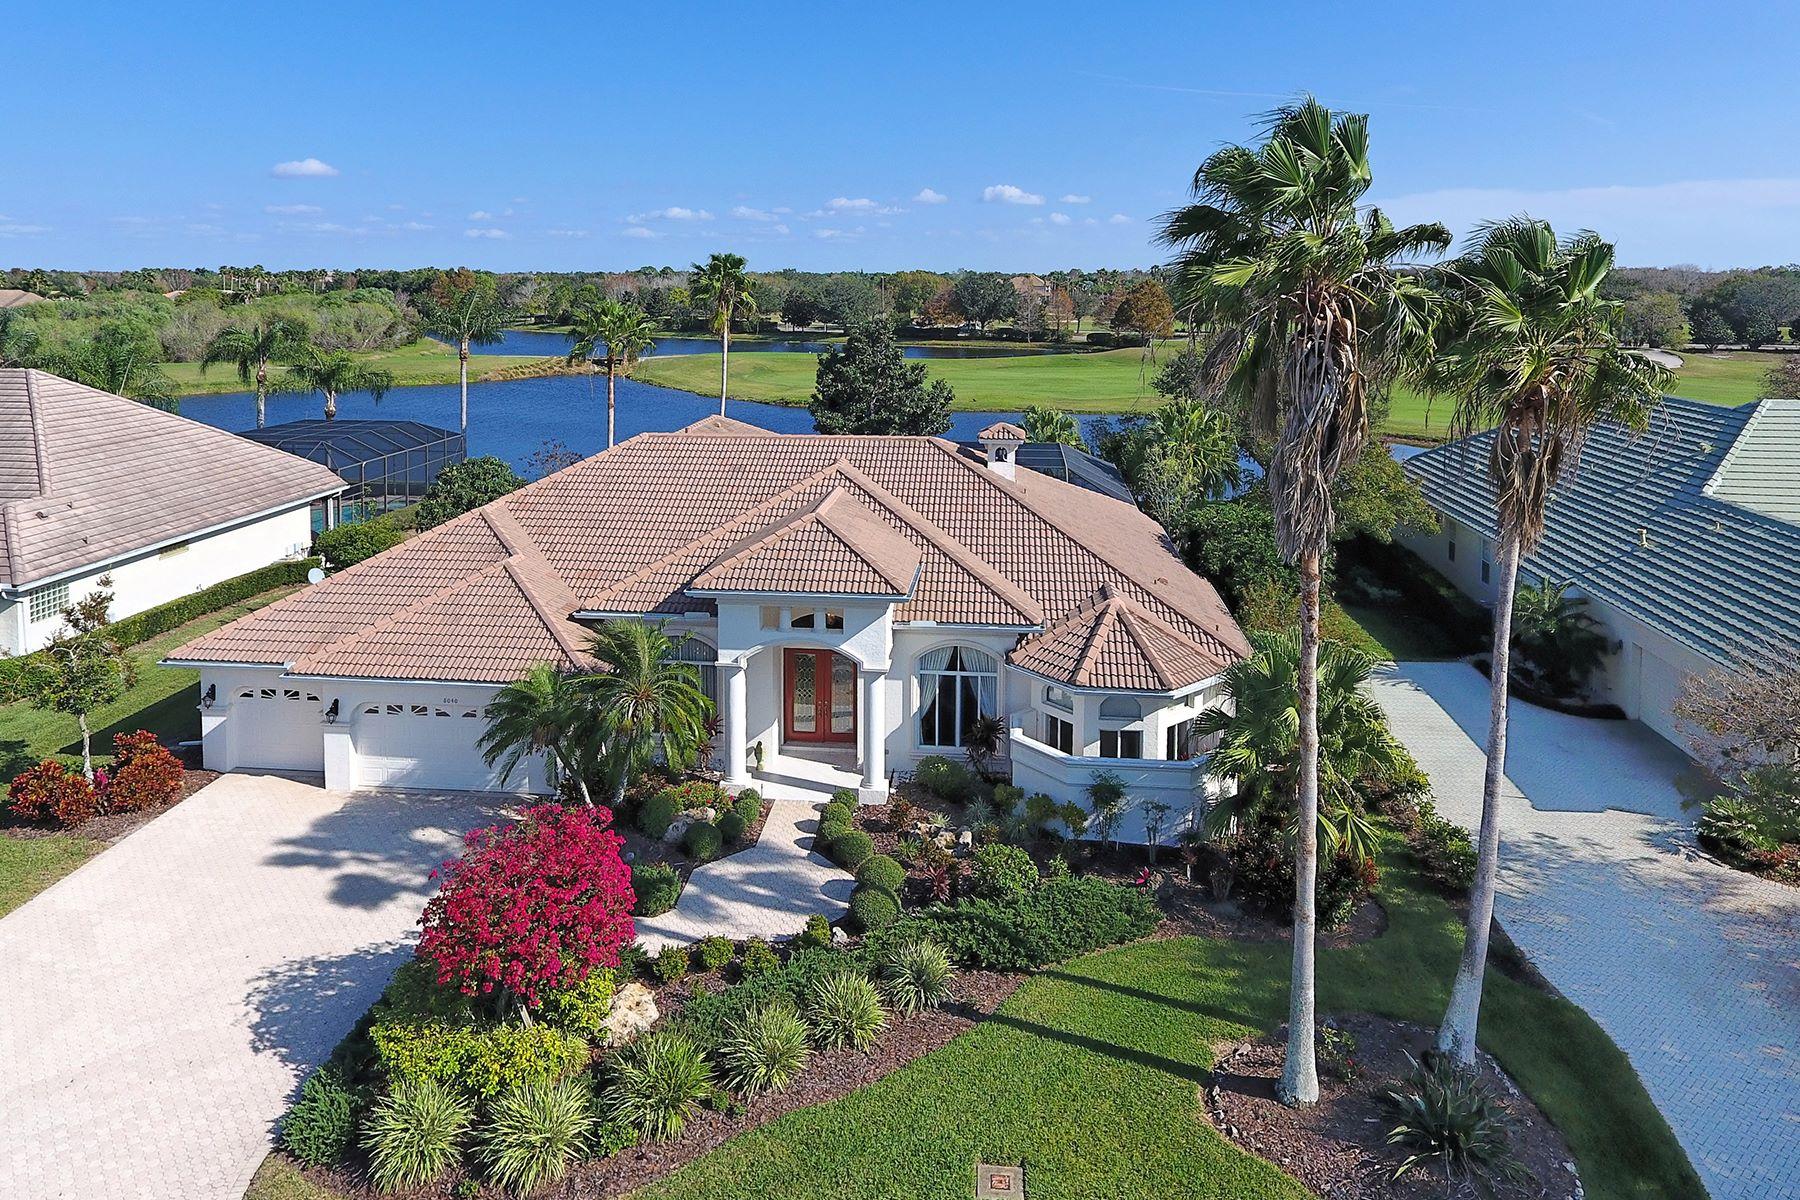 Single Family Home for Sale at LAKEWOOD RANCH COUNTRY CLUB 8040 Royal Birkdale Cir Lakewood Ranch, Florida, 34202 United States